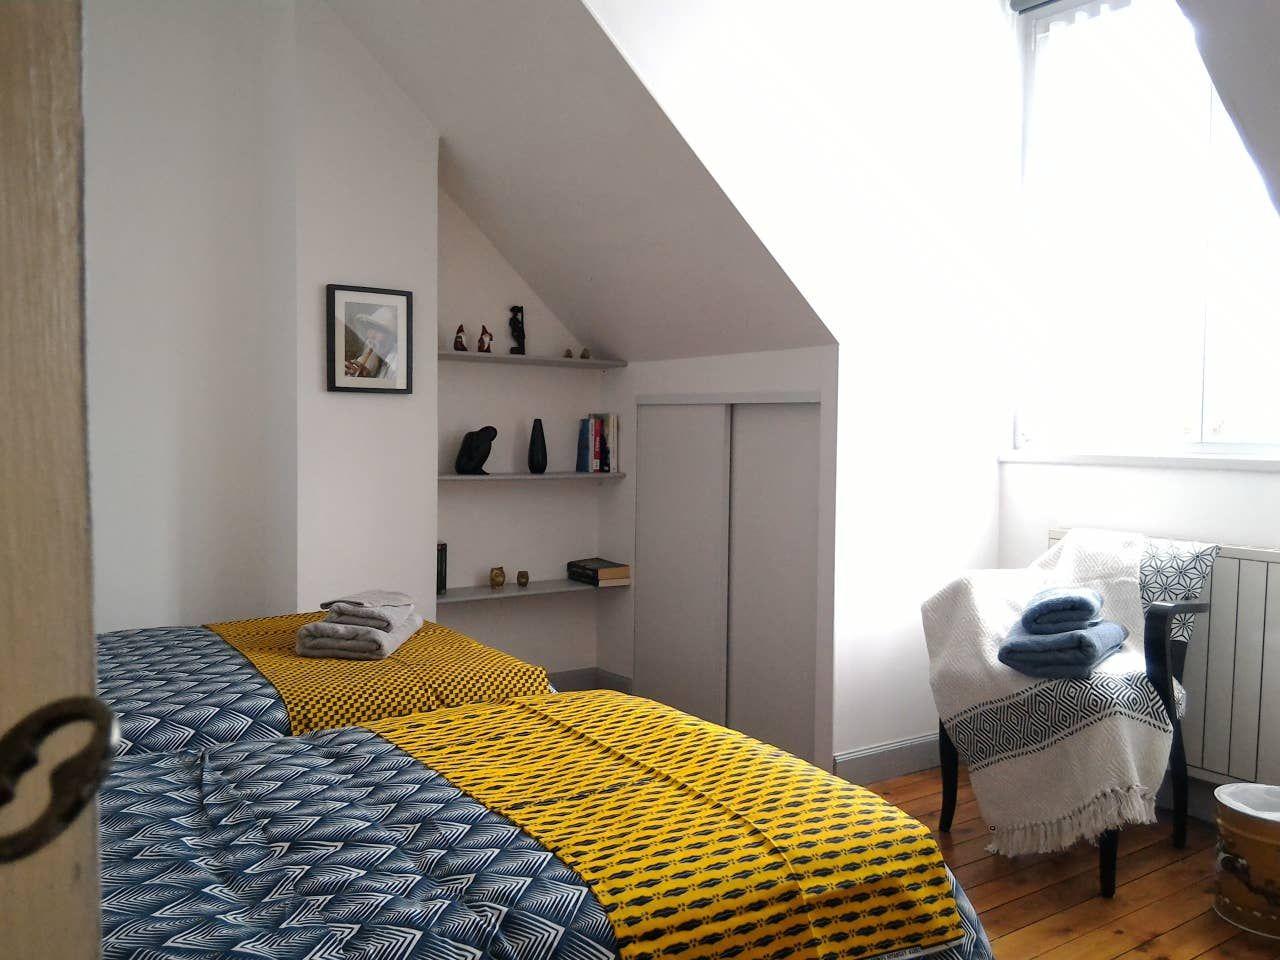 Airbnb Amiens Une Escale Accueillante Et Reposante 1 Chambre En 2020 Chambre Amiens